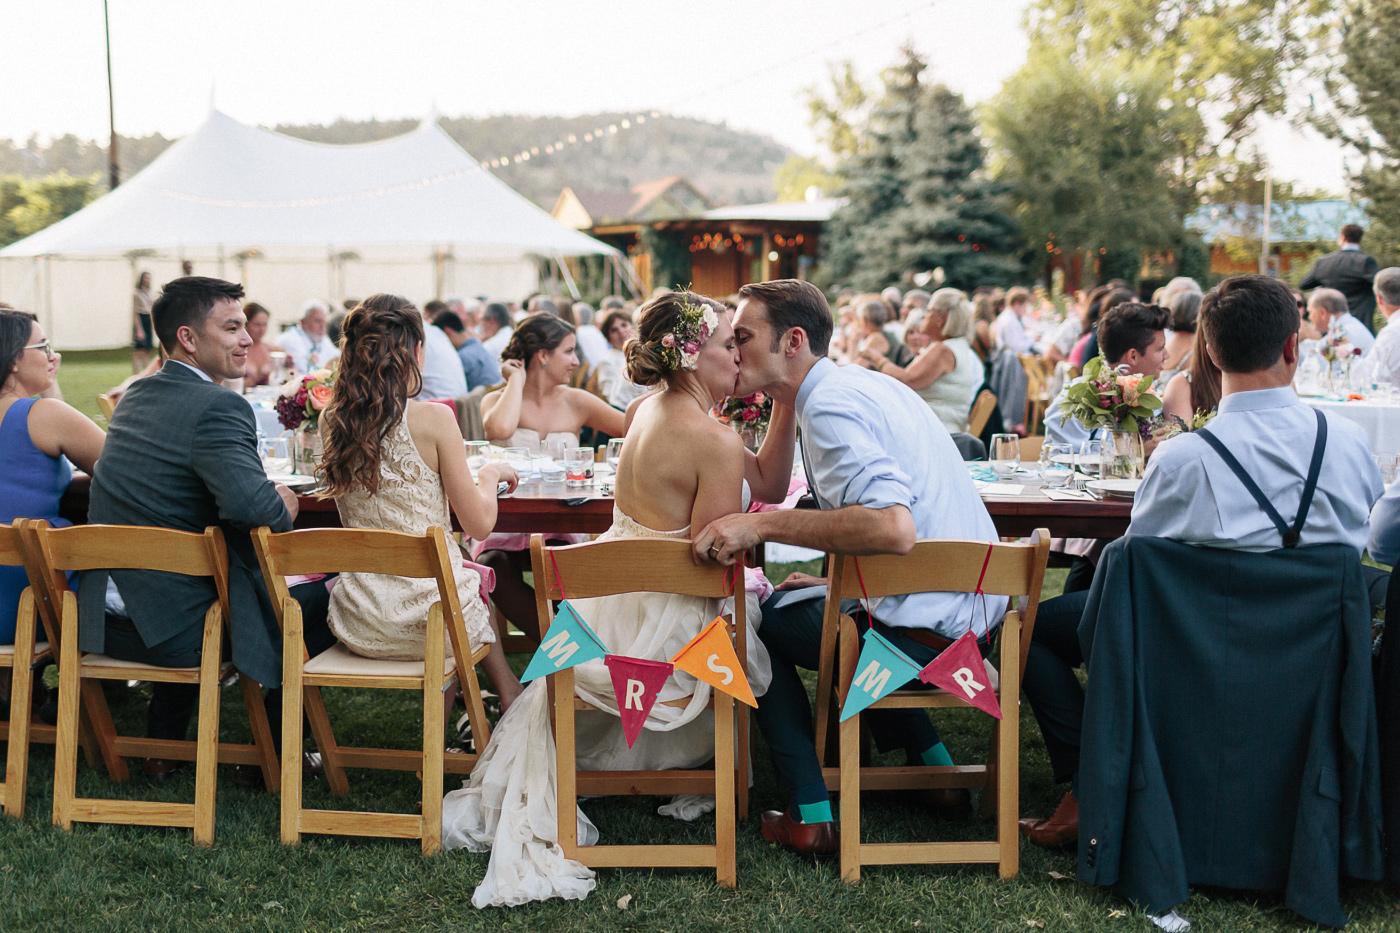 Lyons-Farmette-Wedding-Photographer-Lucy-Austin-Flash-Mob-Dance-61.jpg